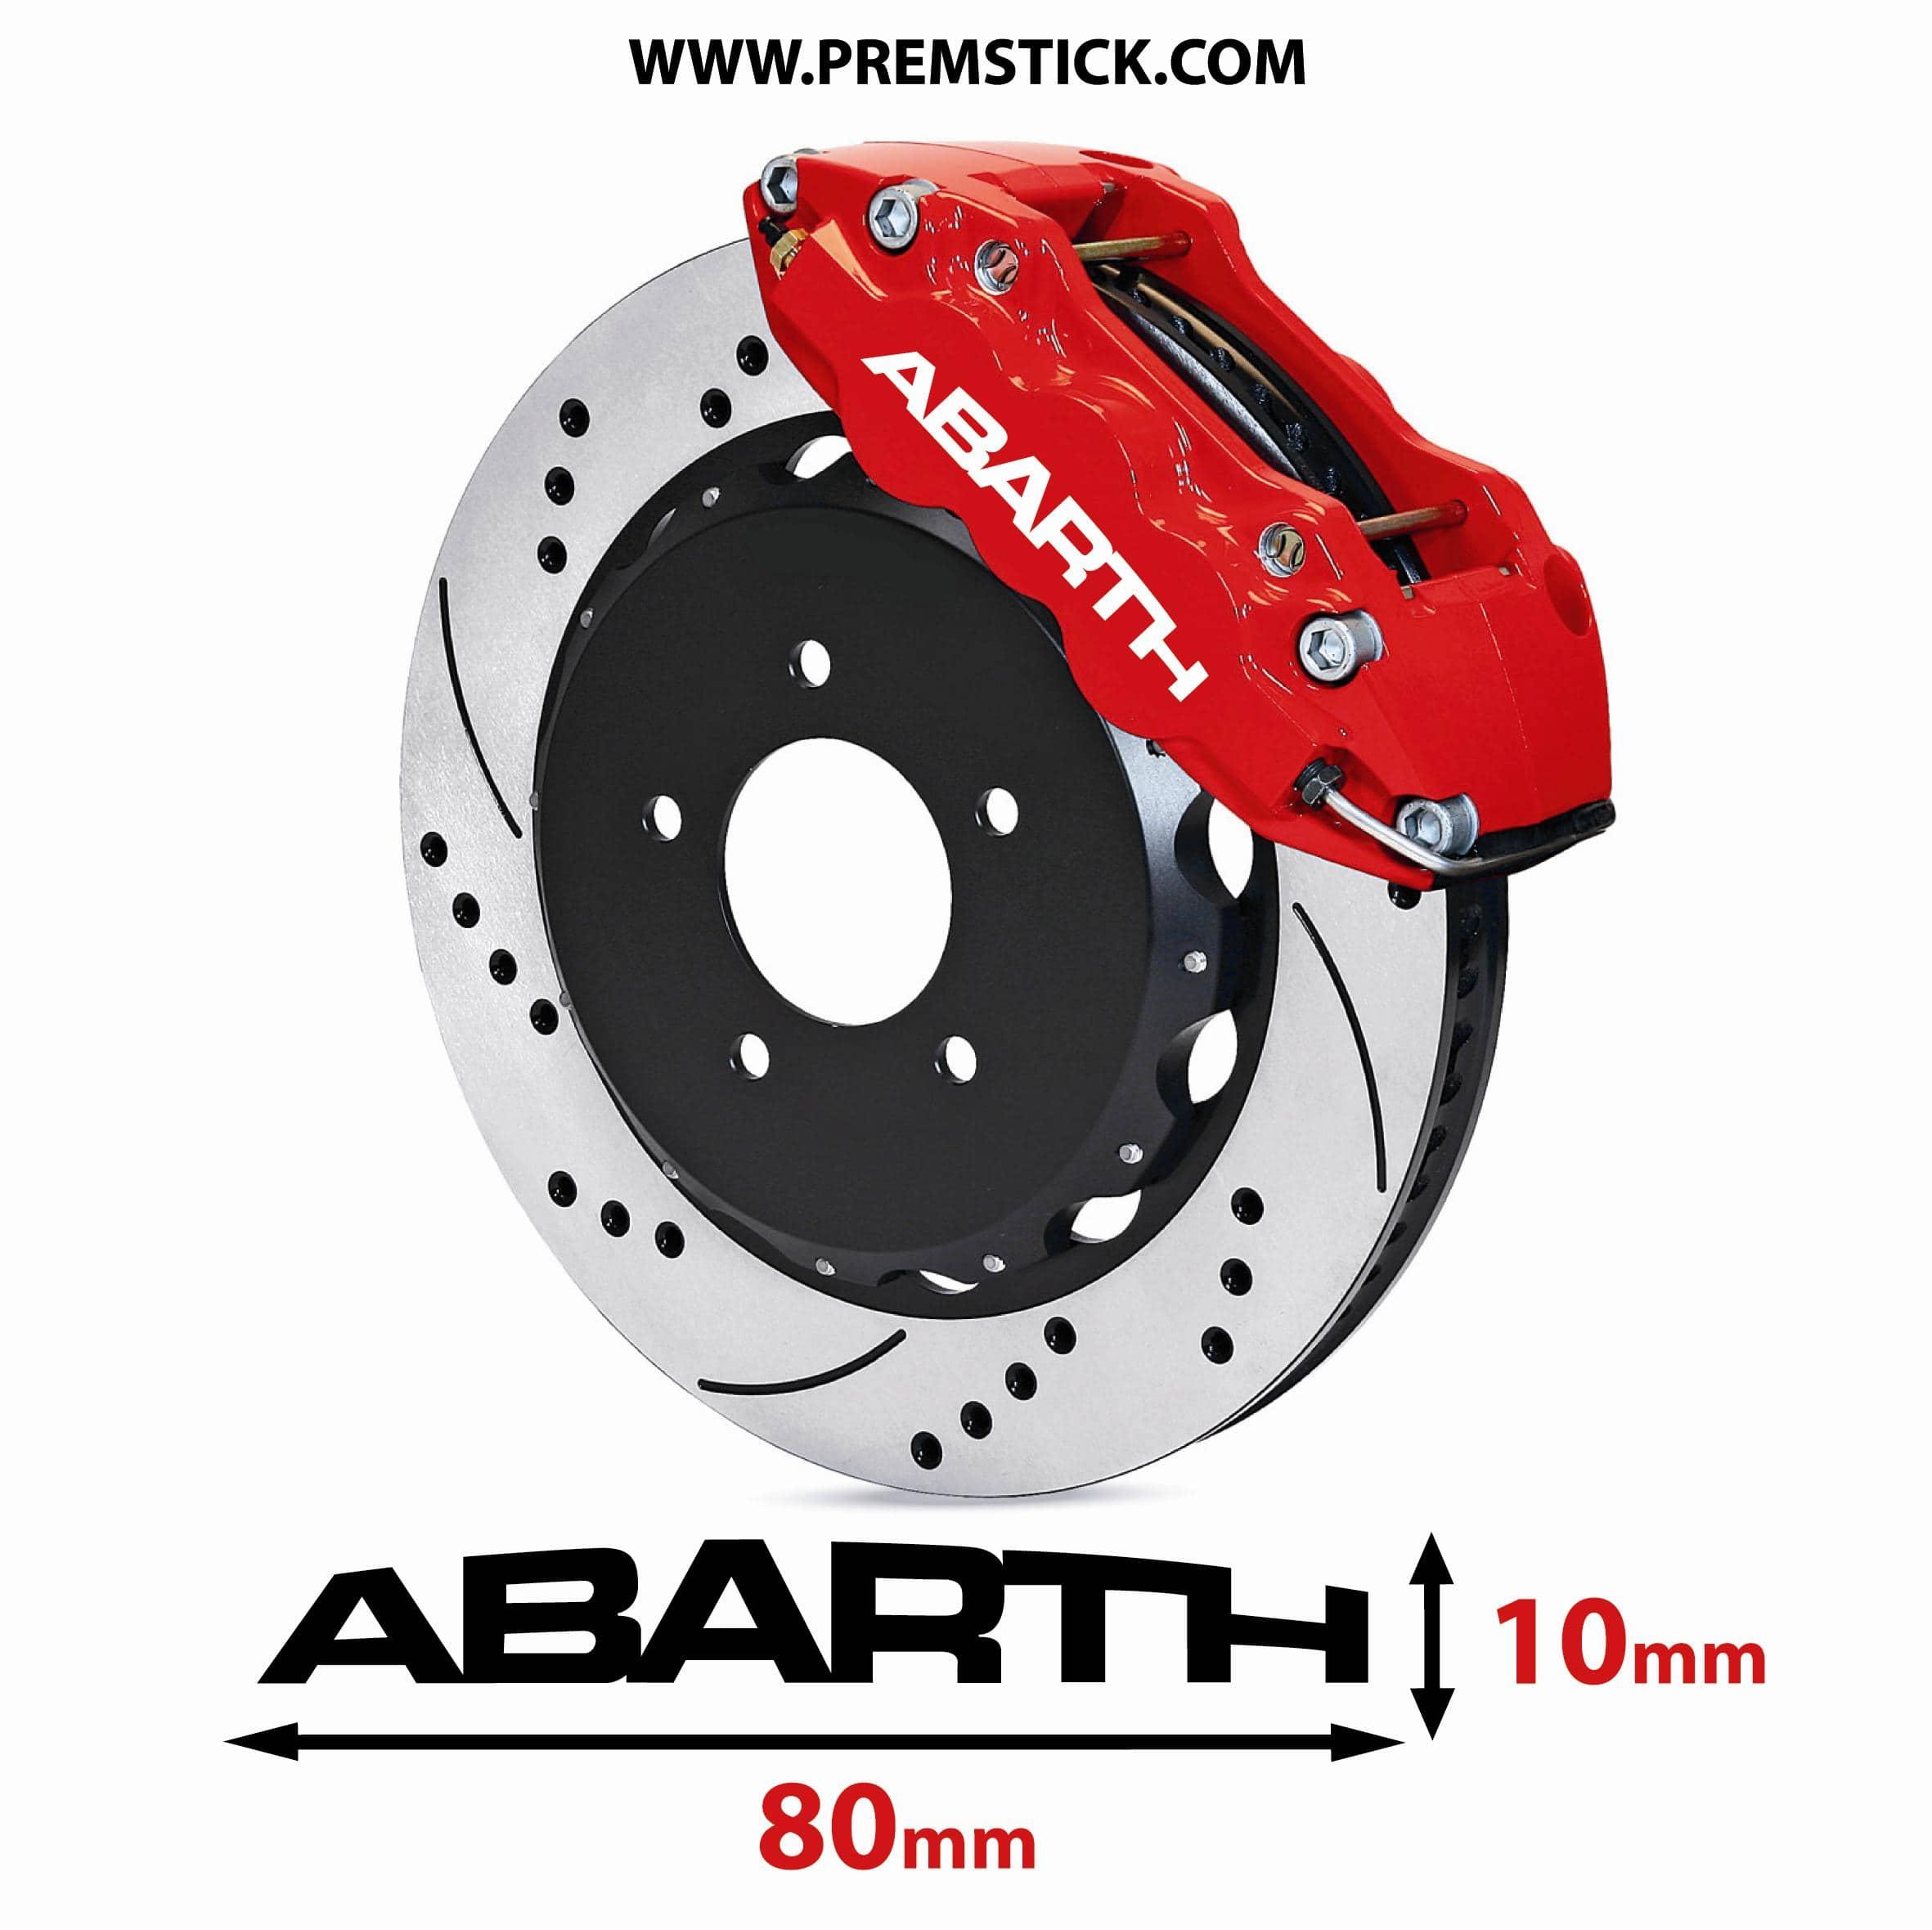 stickers-etrier-de-frein-abarth-ref2-autocollant-etriers-freins-logo-voiture-sticker-adhesif-auto-car-disque-plaquette-pneu-jantes-racing-tuning-sponsors-sport-min